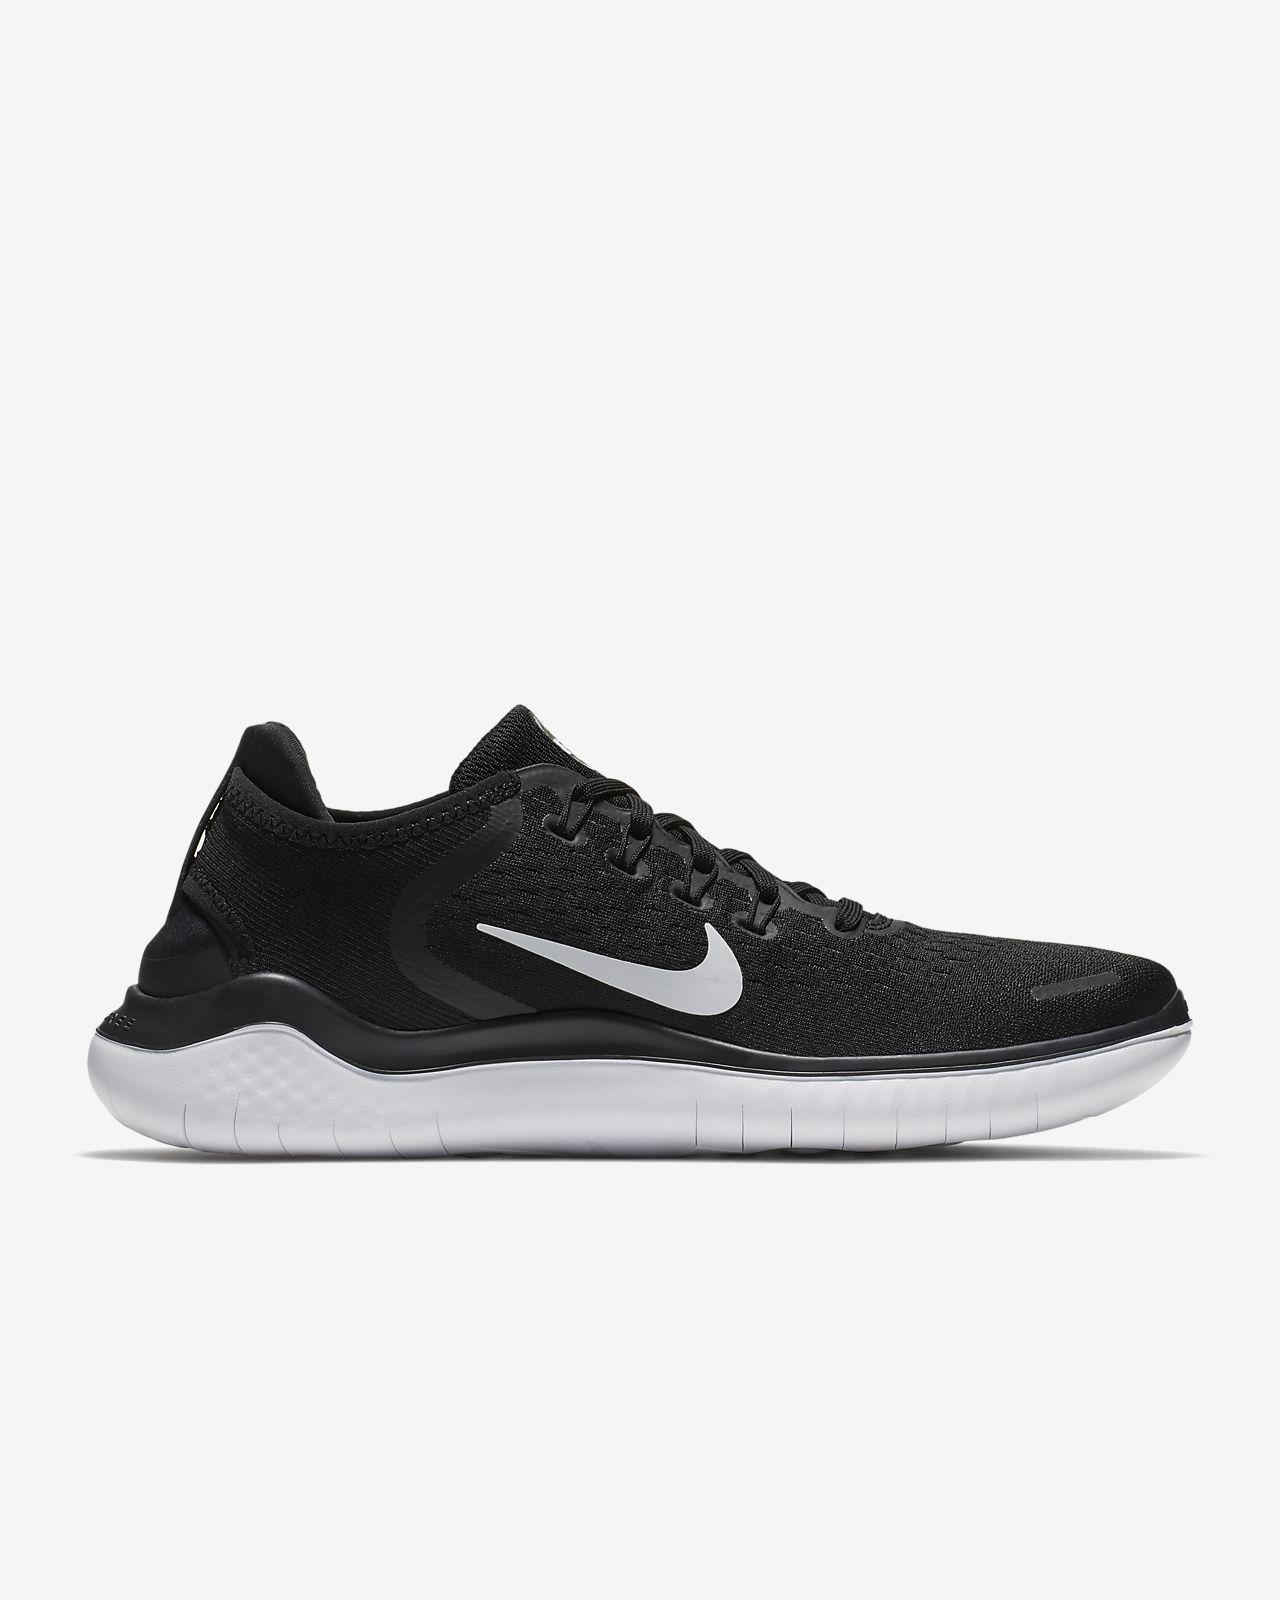 Nike Free RN 2018 Herren Laufschuh